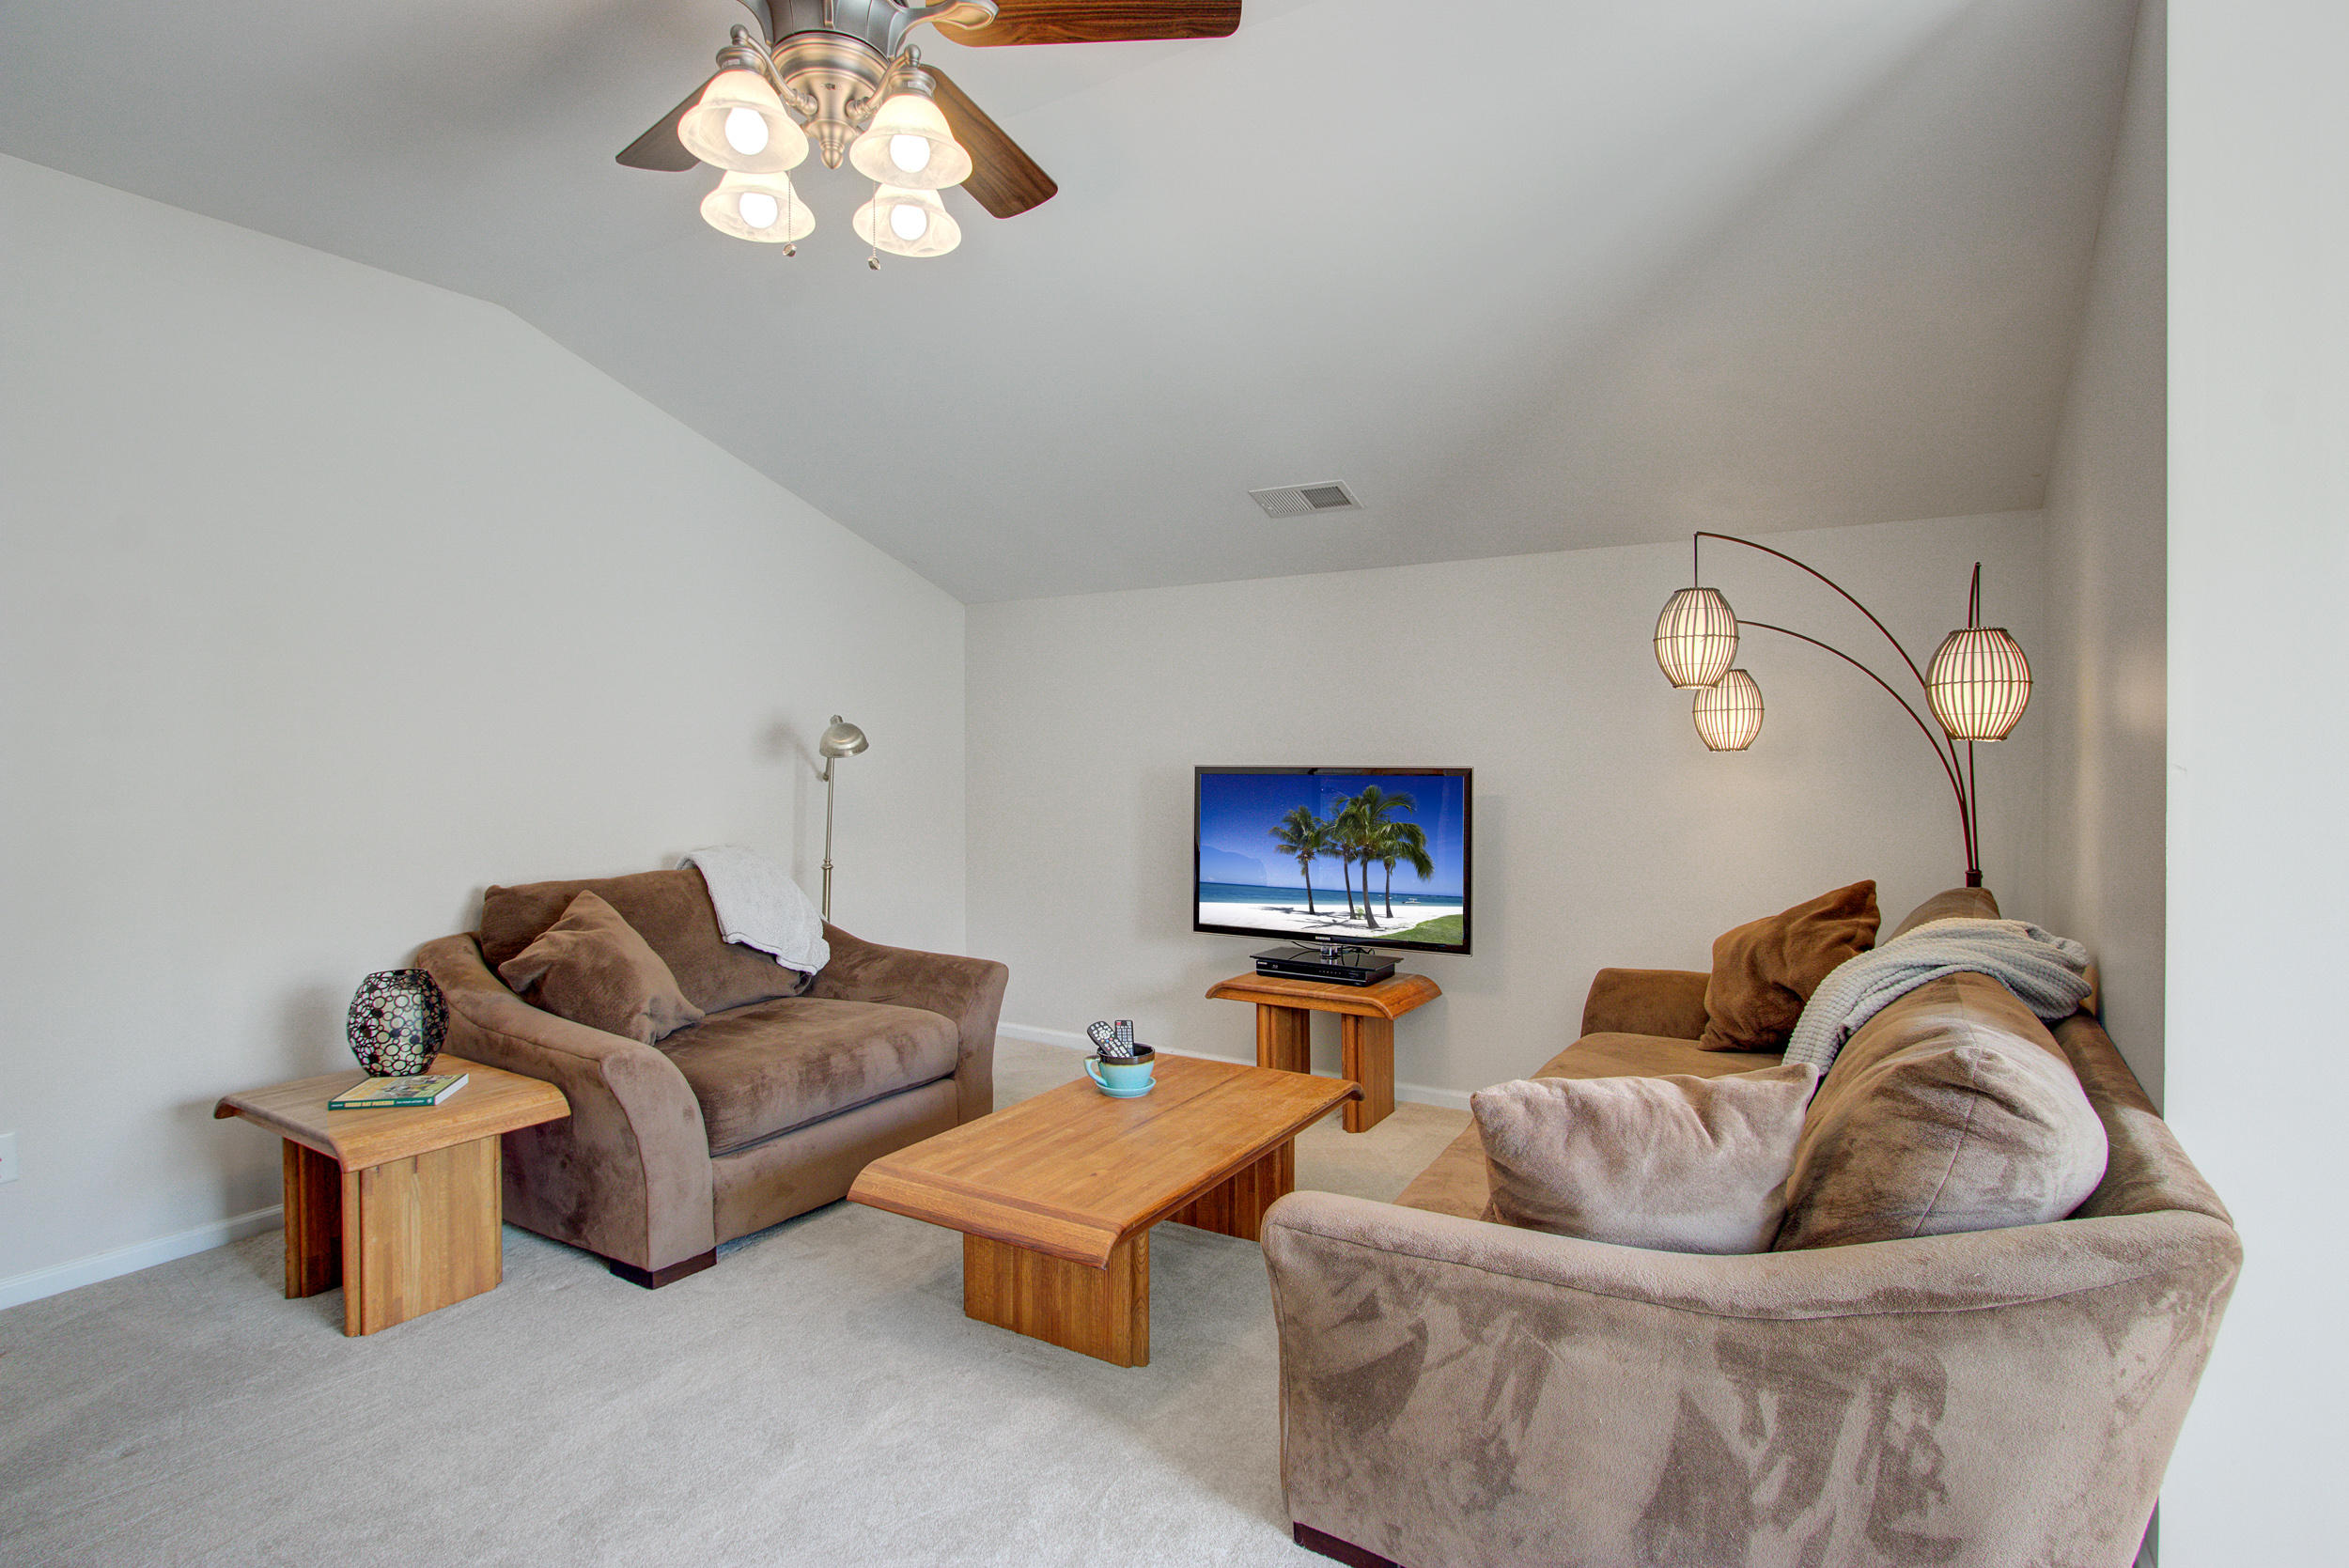 Oakley Pointe Homes For Sale - 576 English Oak, Moncks Corner, SC - 34